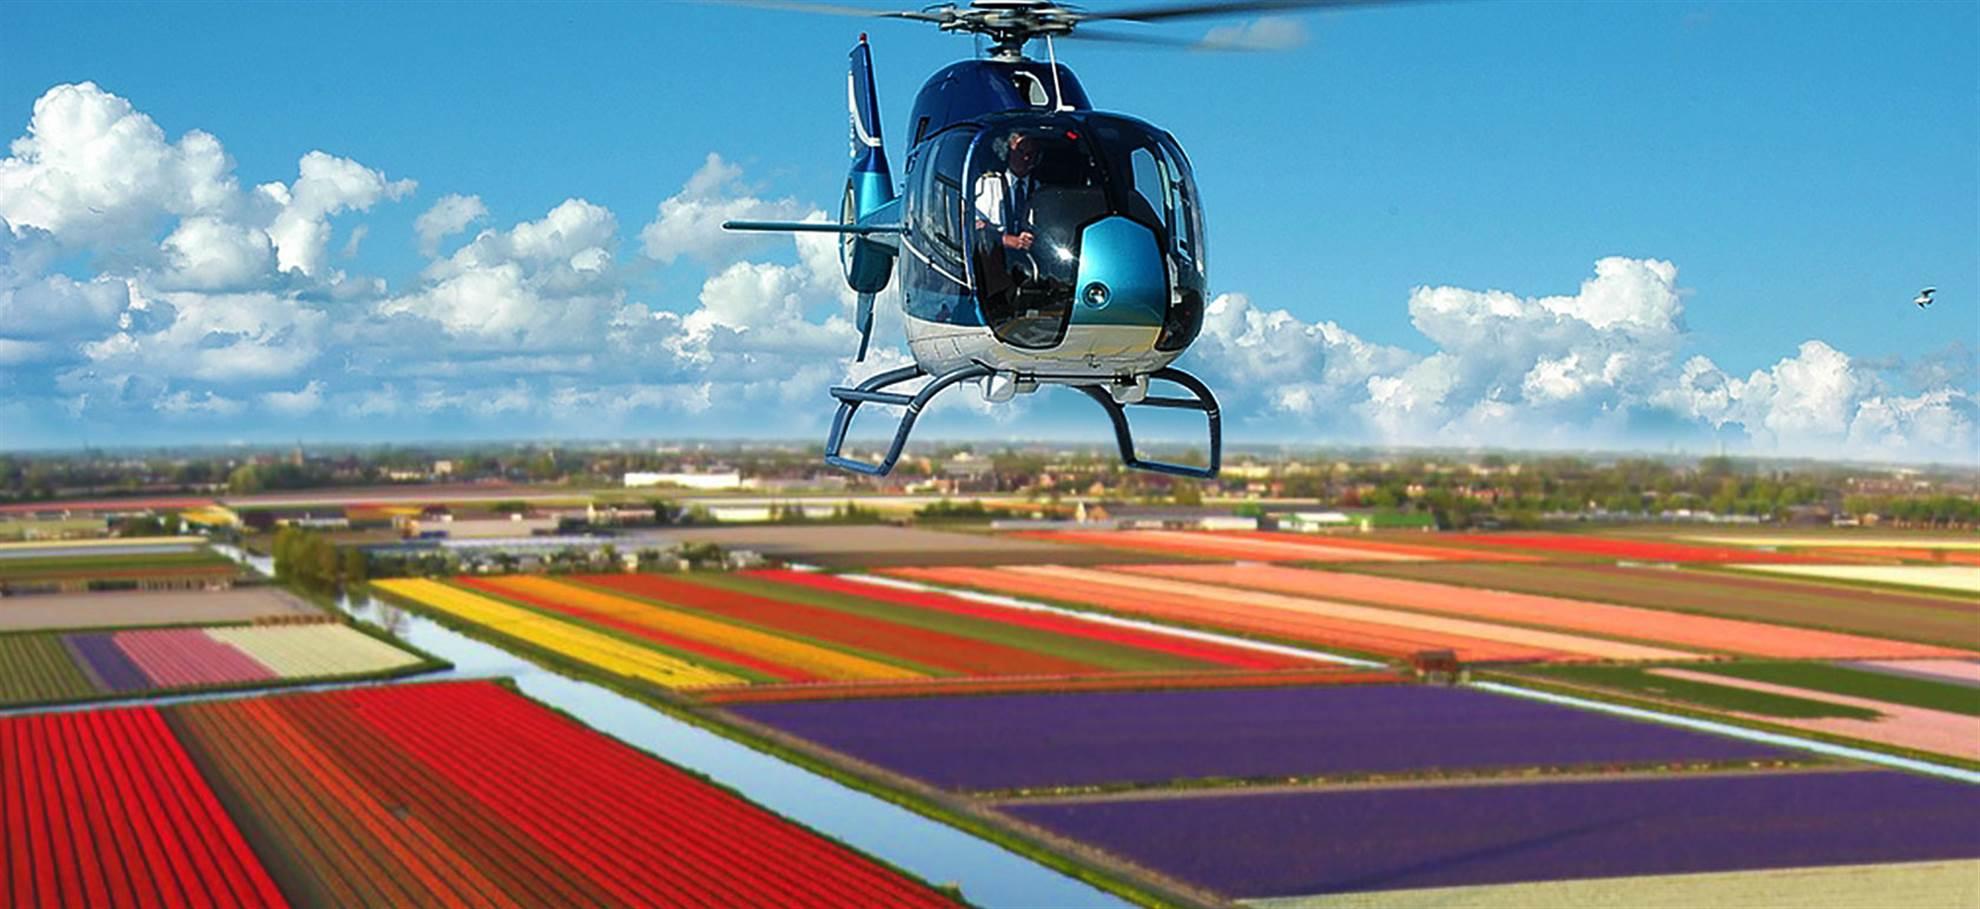 Vôo de Helicóptero em Keukenhof